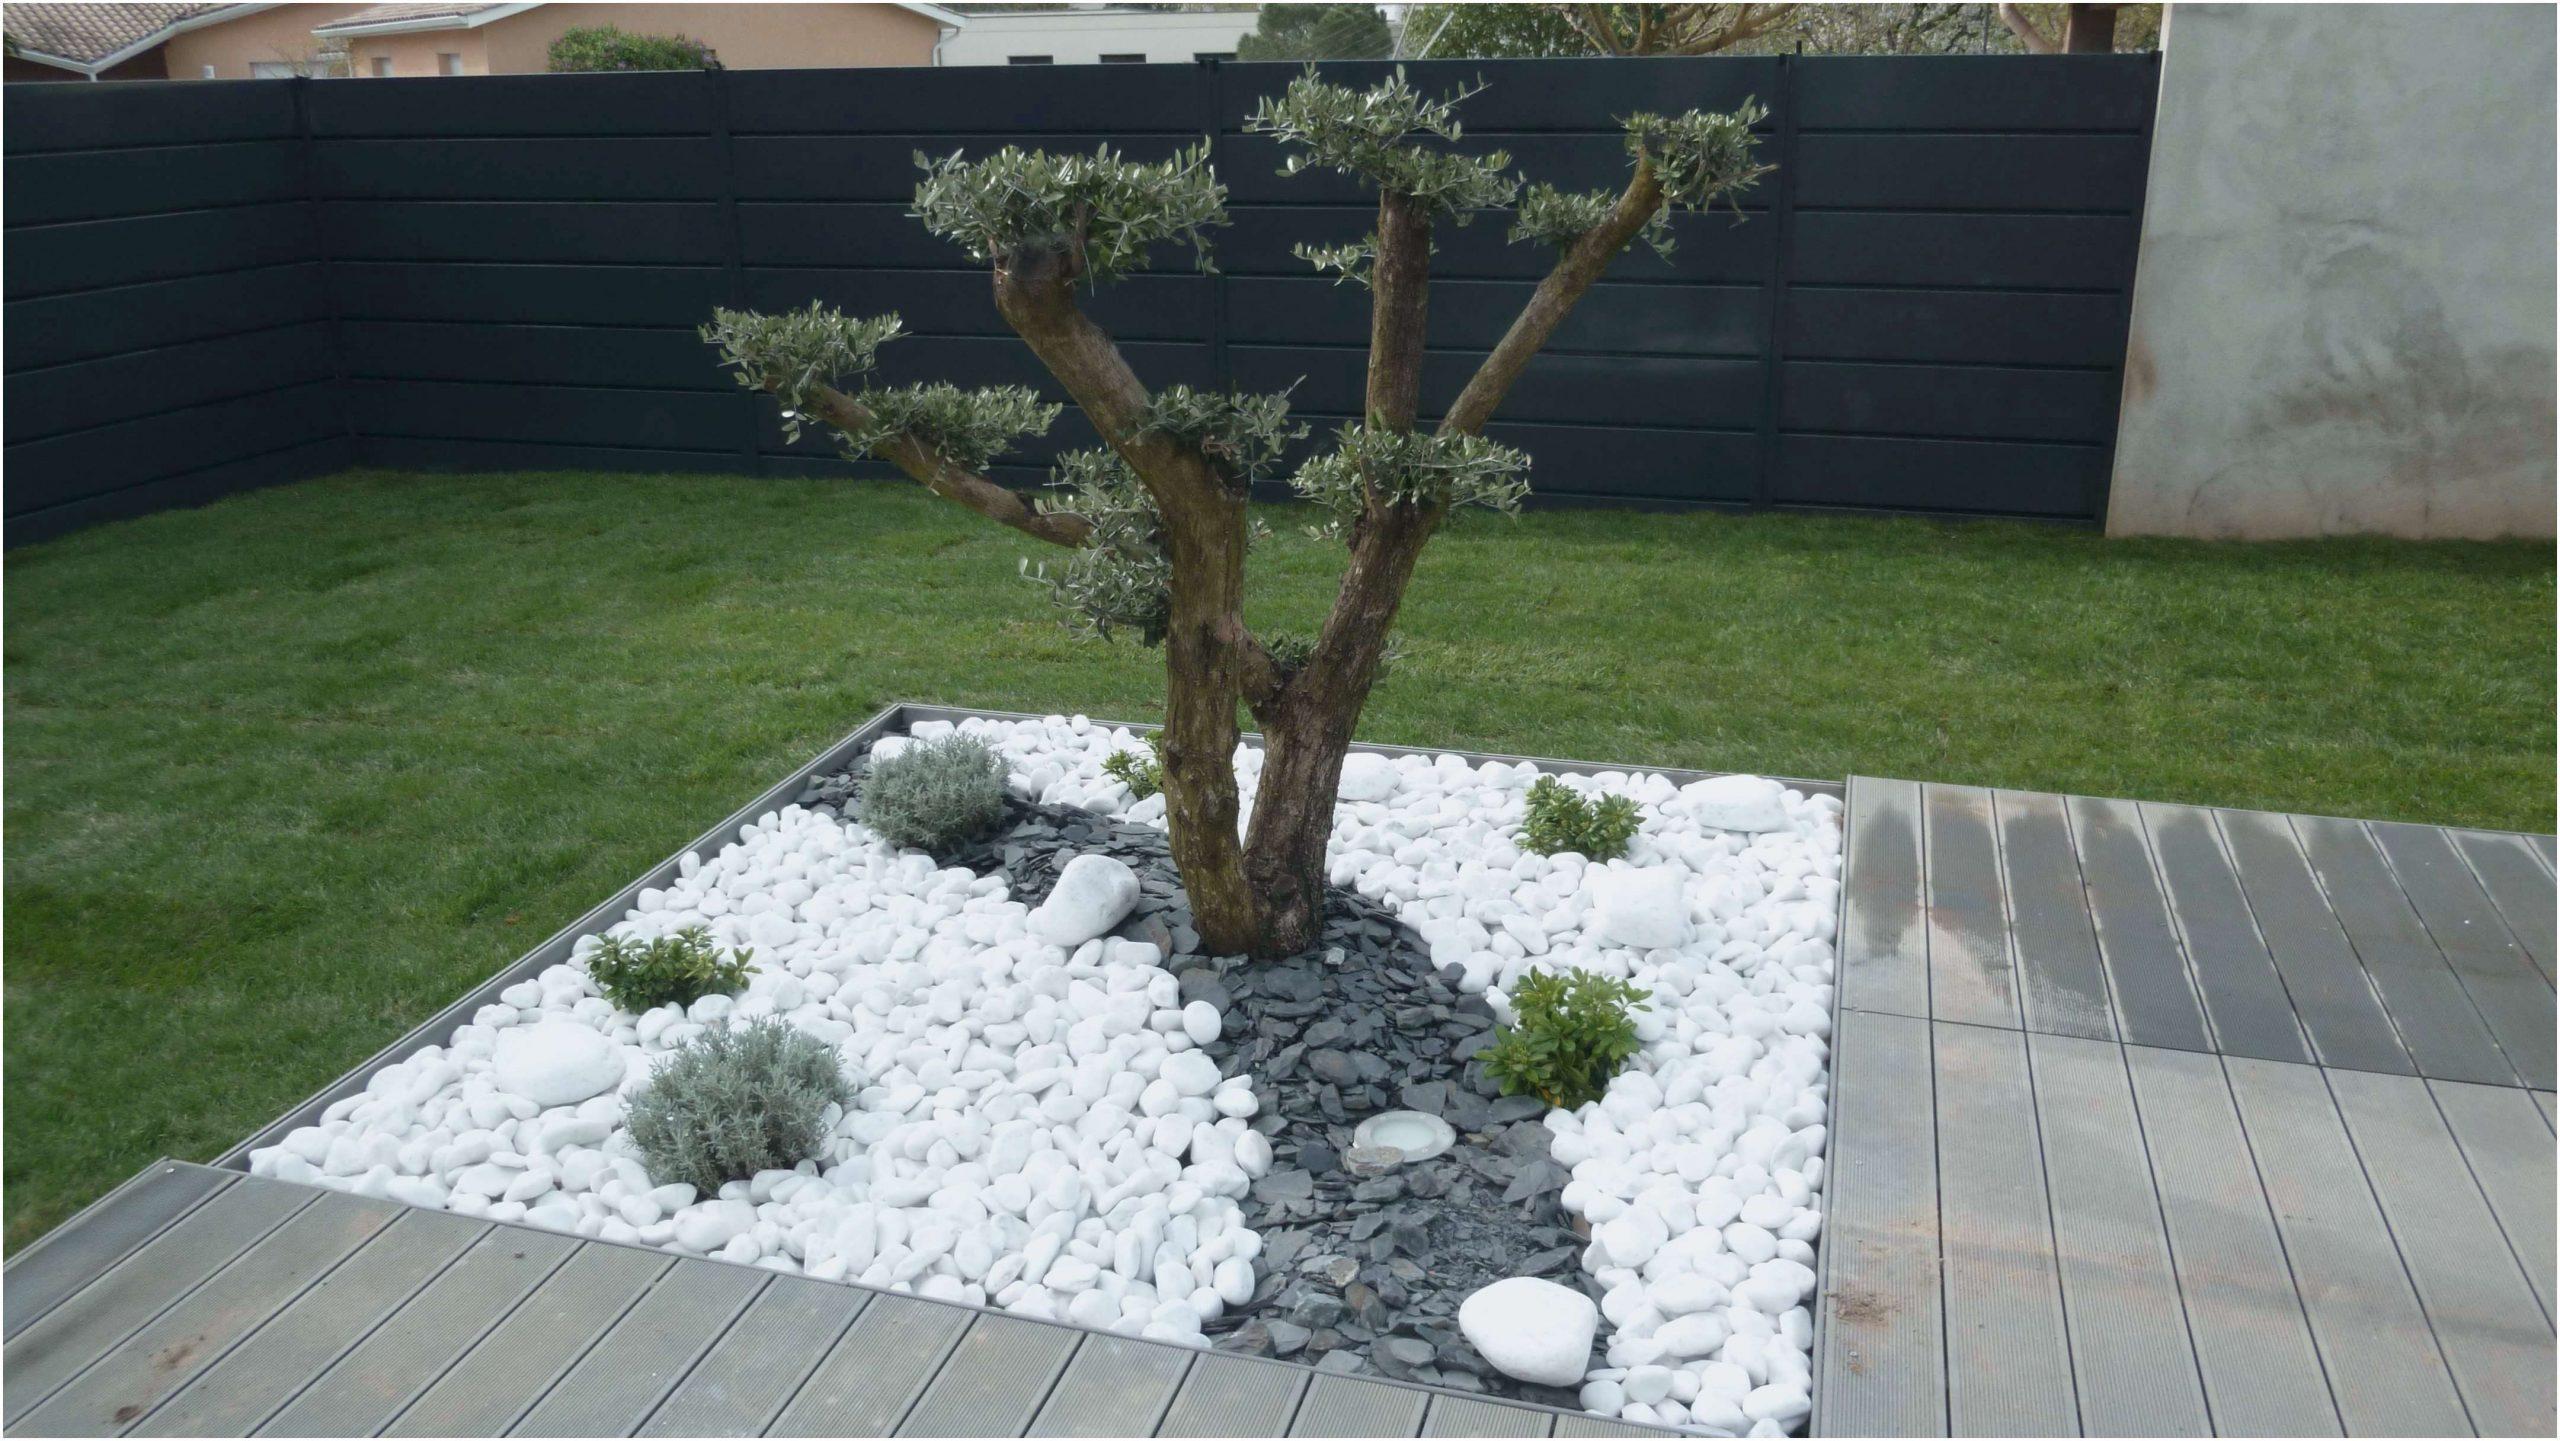 Idee Deco Jardin Avec Gravillon | Idee Deco Jardin ... destiné Galet Blanc Pas Cher